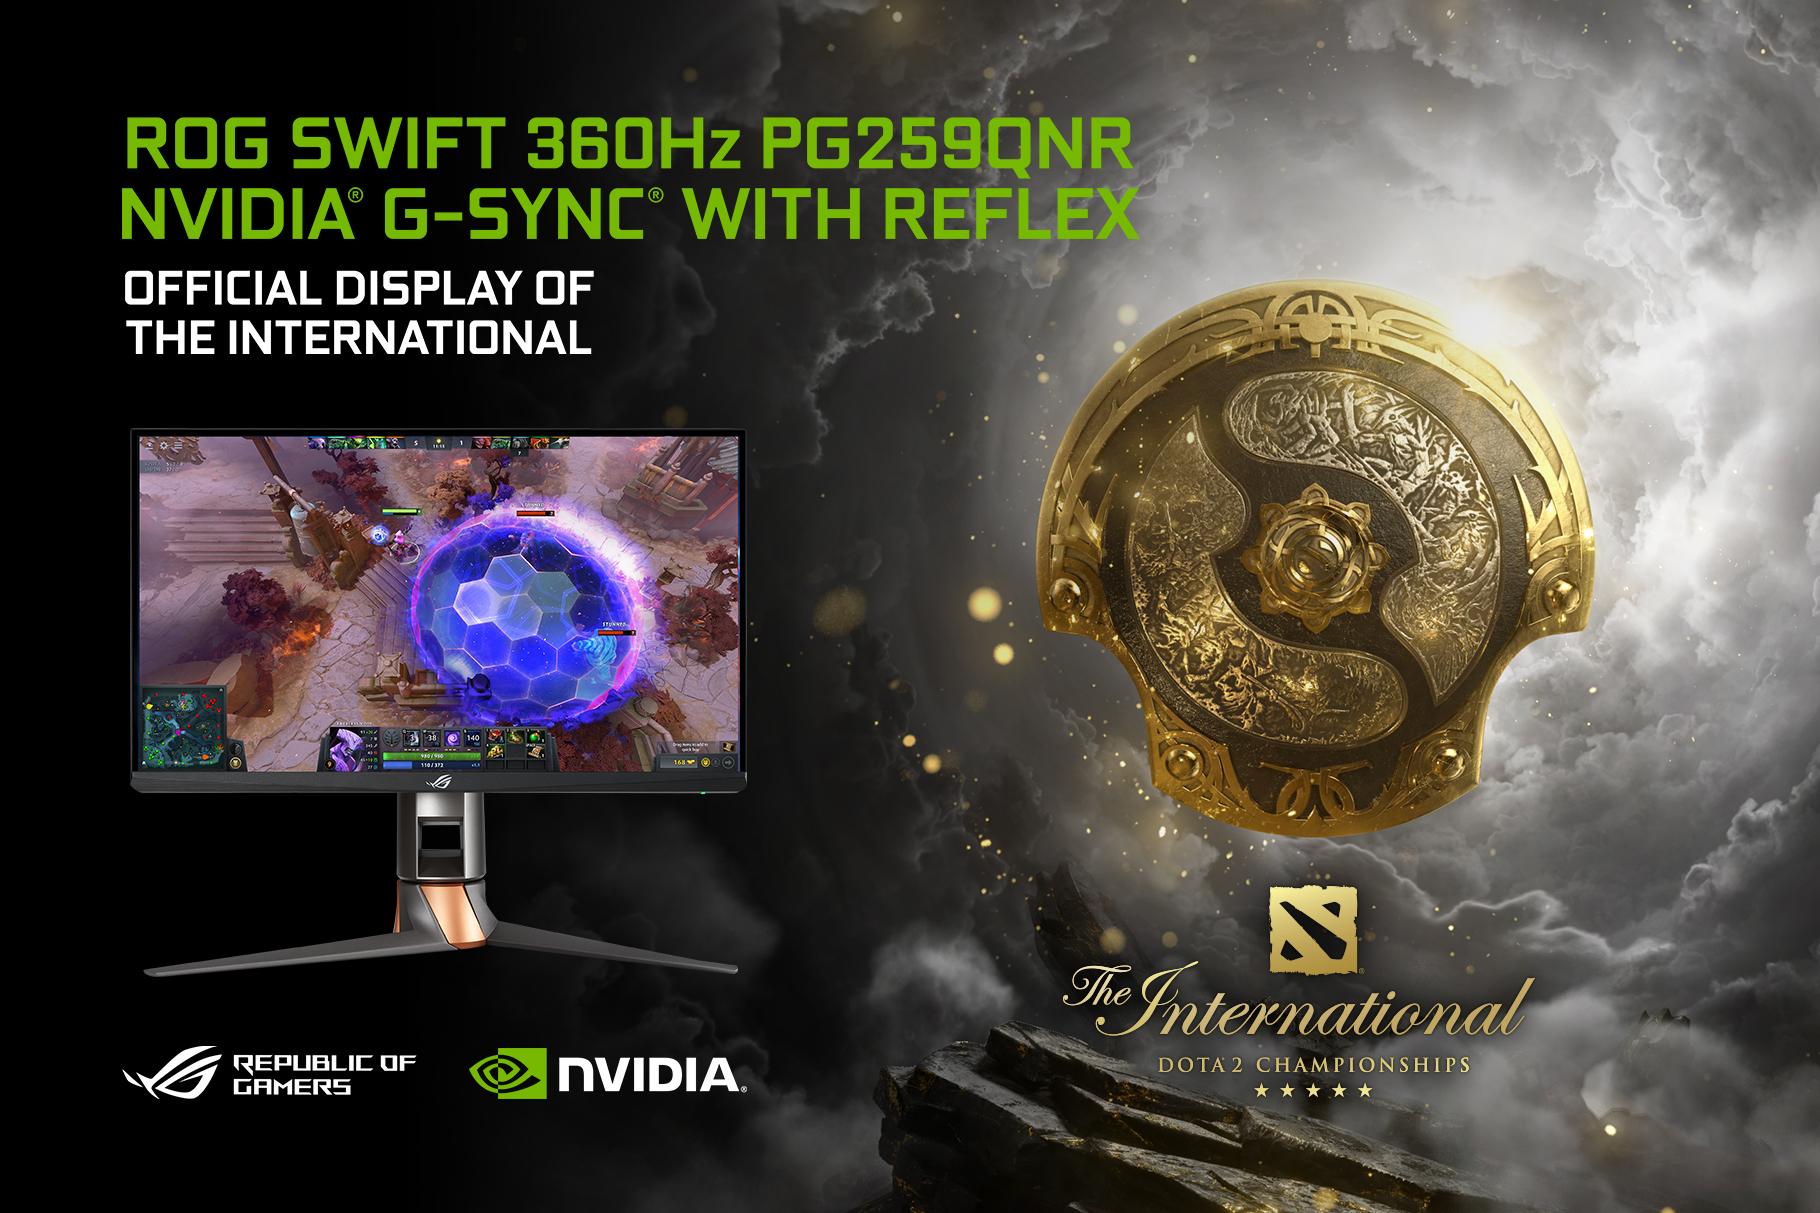 ASUS ROG Swift 360 Hz DOTA 2